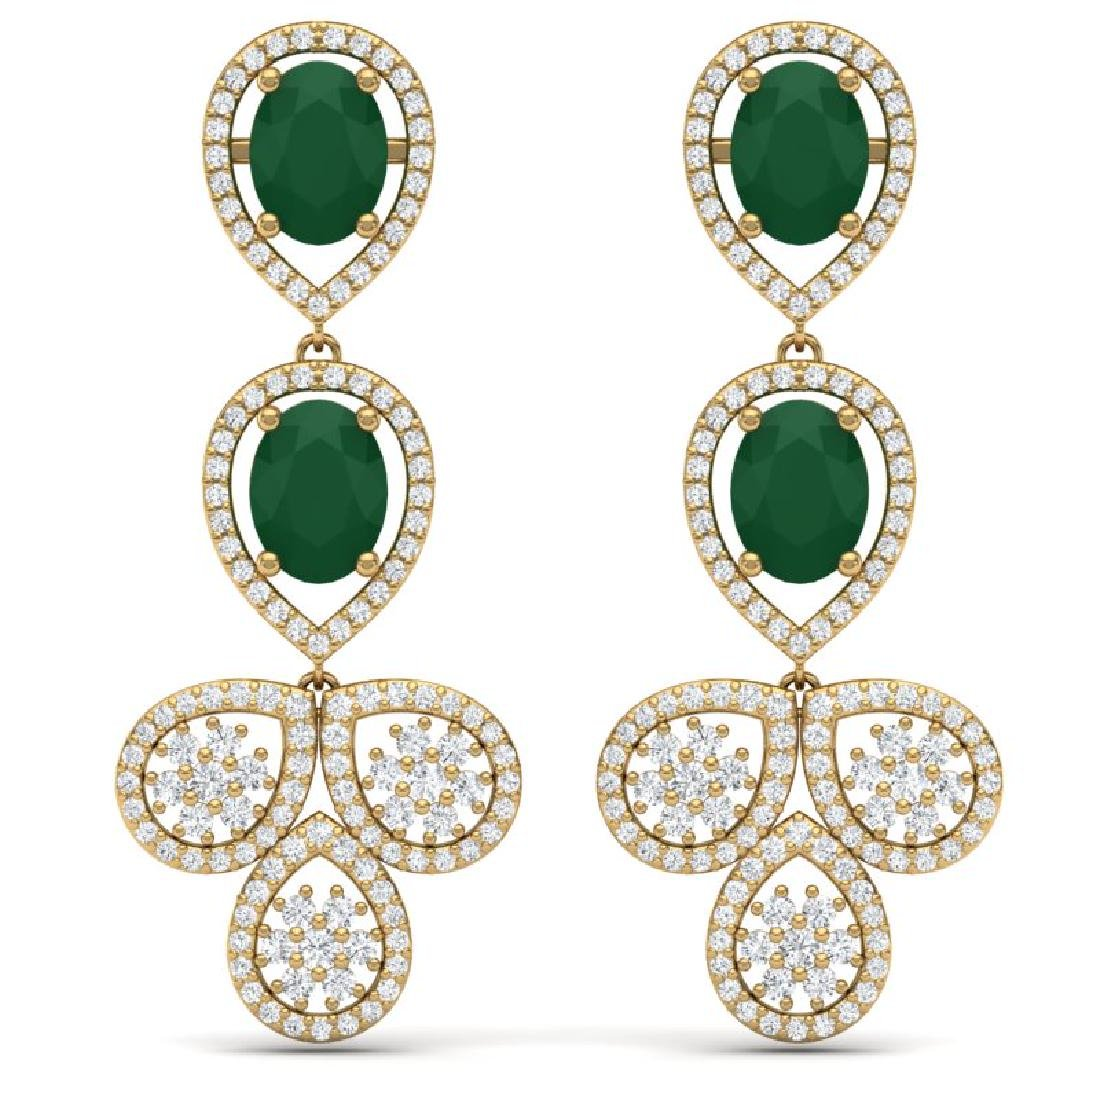 9.75 CTW Royalty Emerald & VS Diamond Earrings 18K